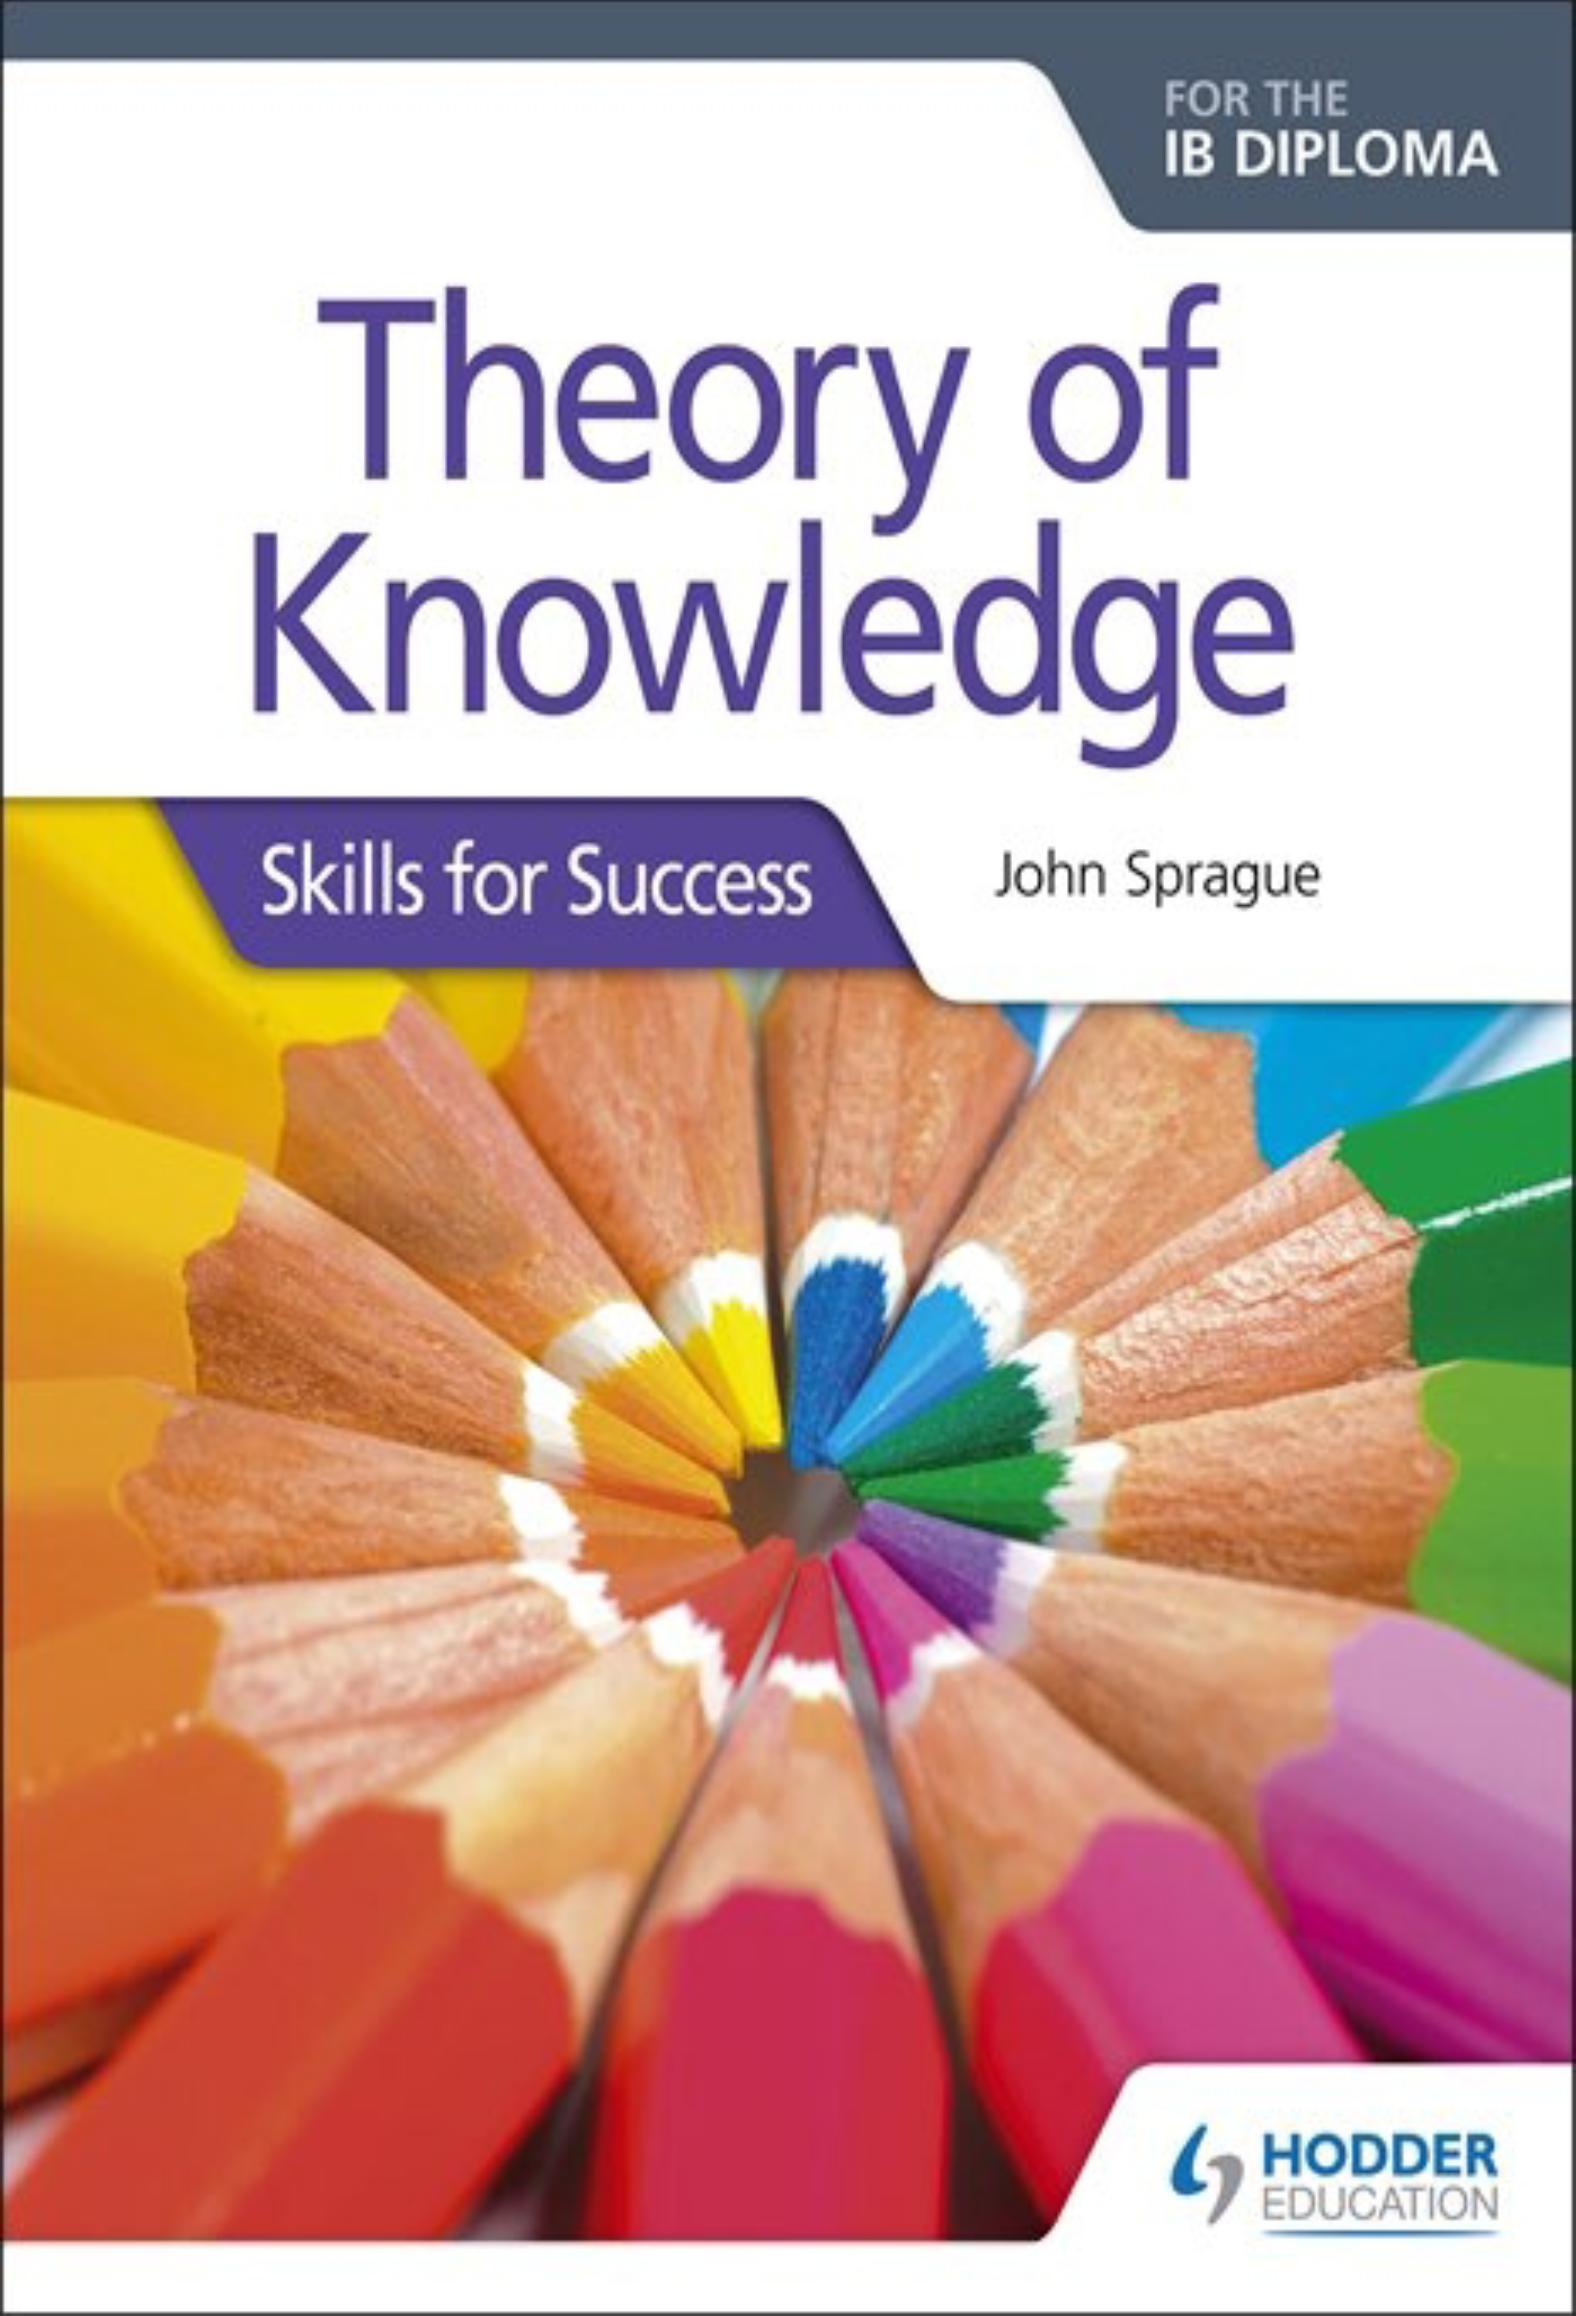 历年国际IB Theory of Knowledge课程教材课本